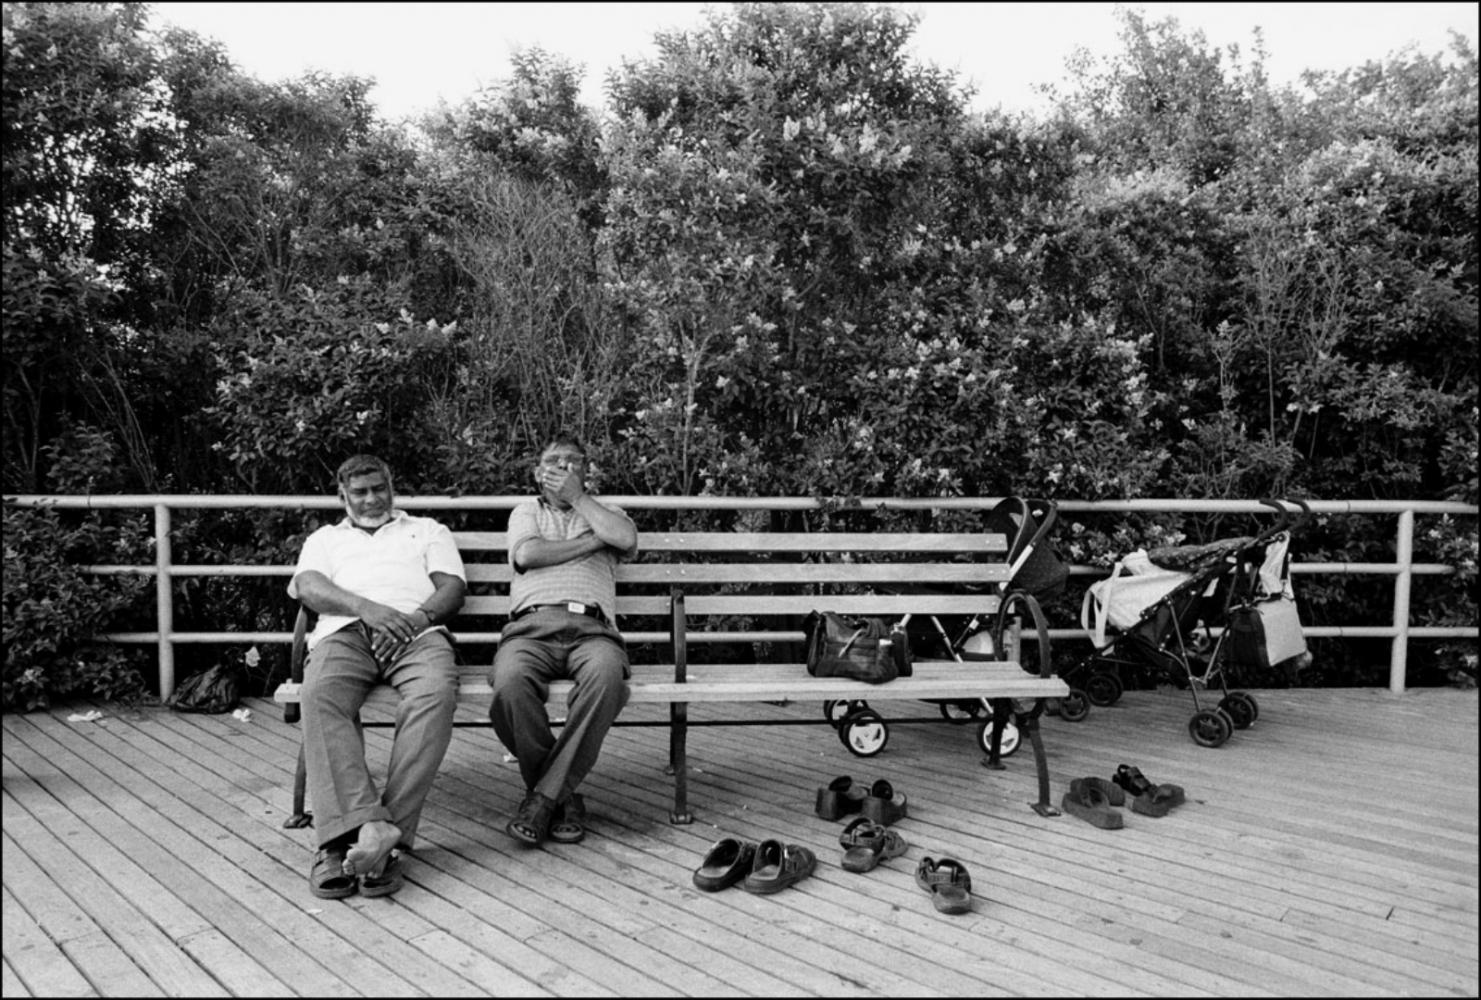 Yawn, Coney Island, NY, July 4, 2004